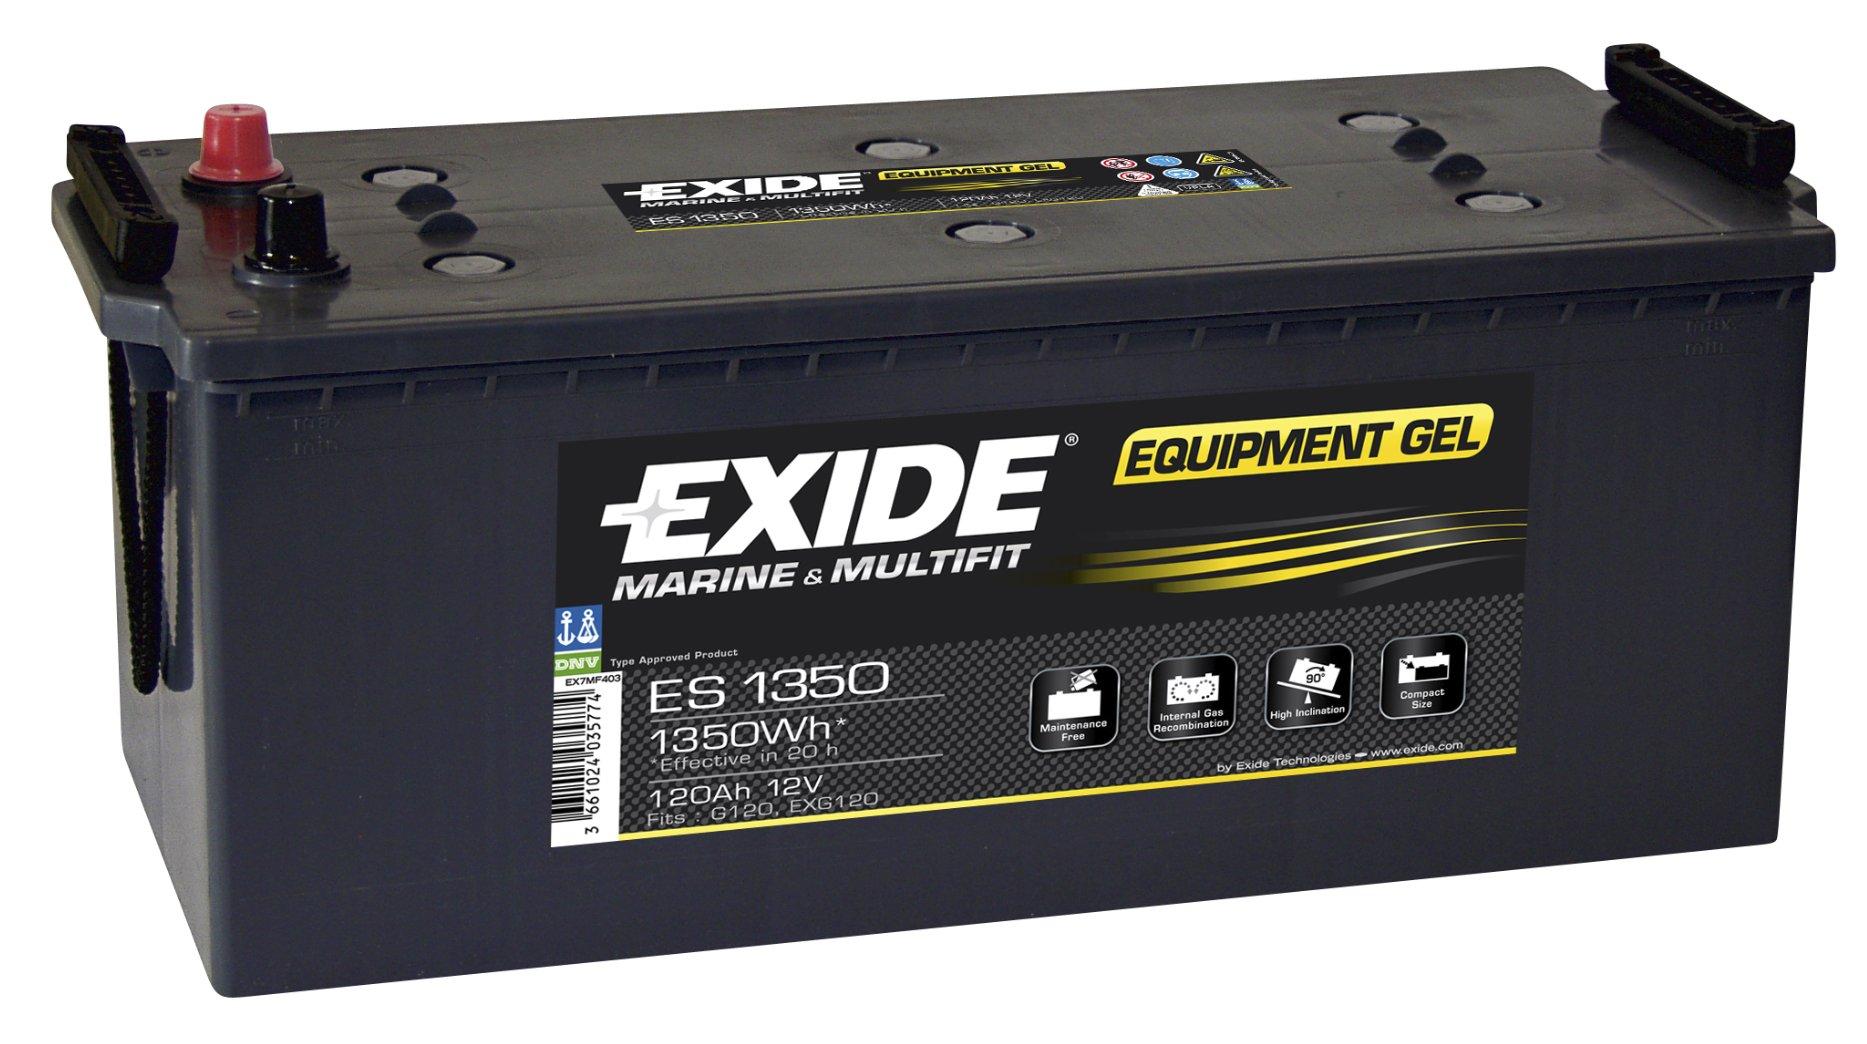 Batéria 120Ah Exide GEL 1350Wh ES1350 Wroclaw